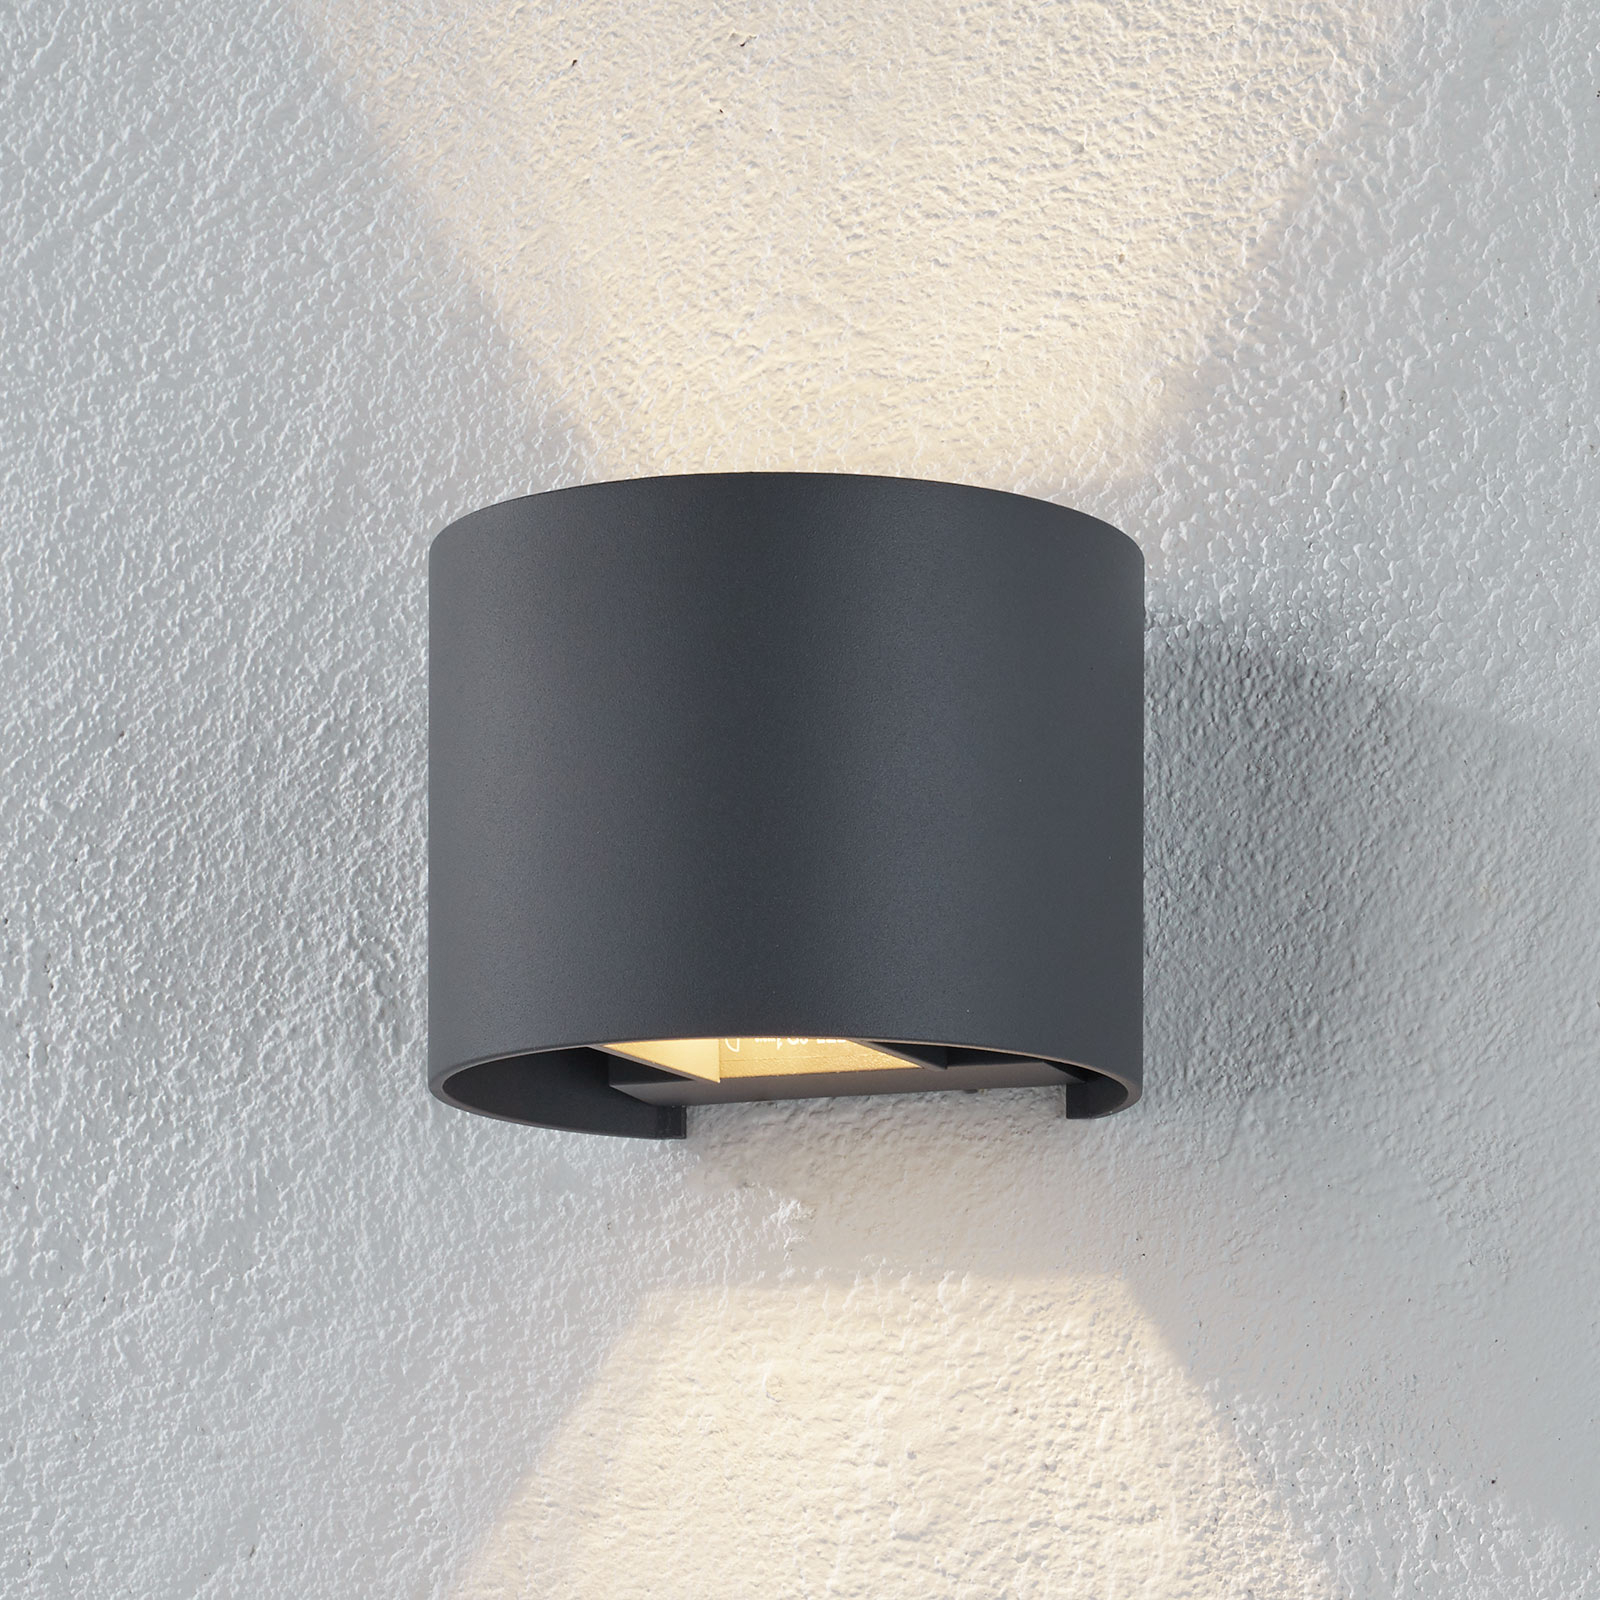 Xio-LED-seinävalaisin, leveys 13 cm, harmaa